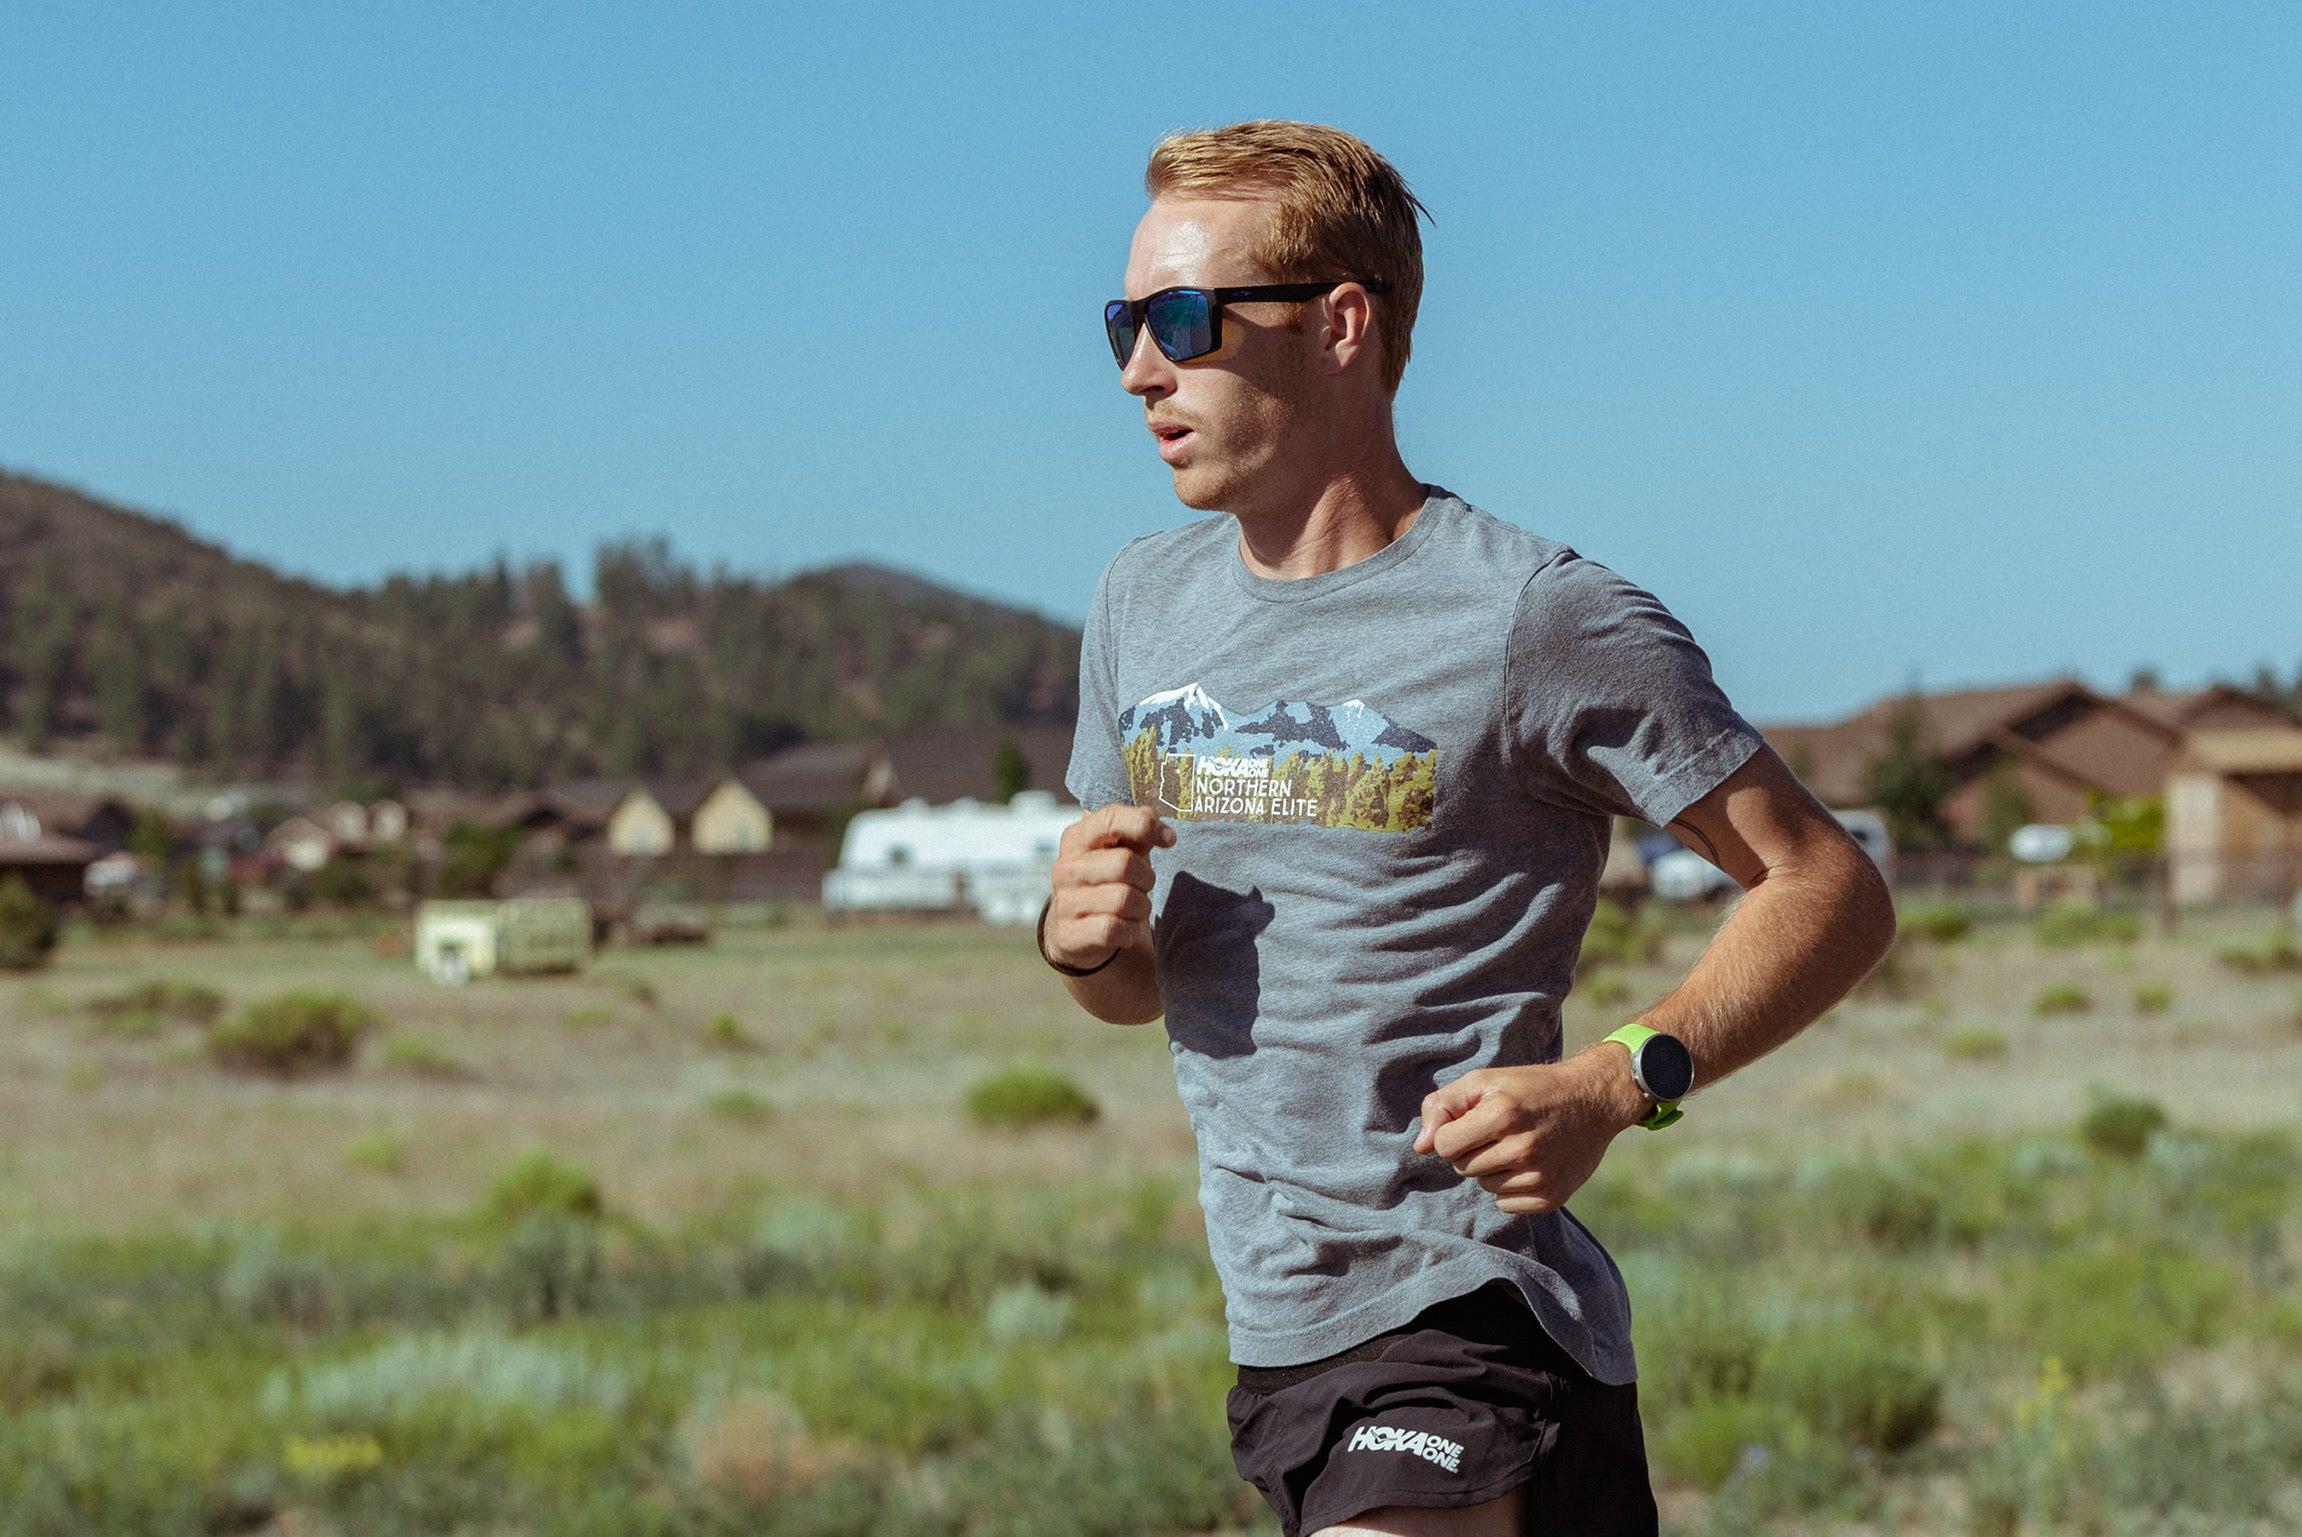 Scott Fauble training